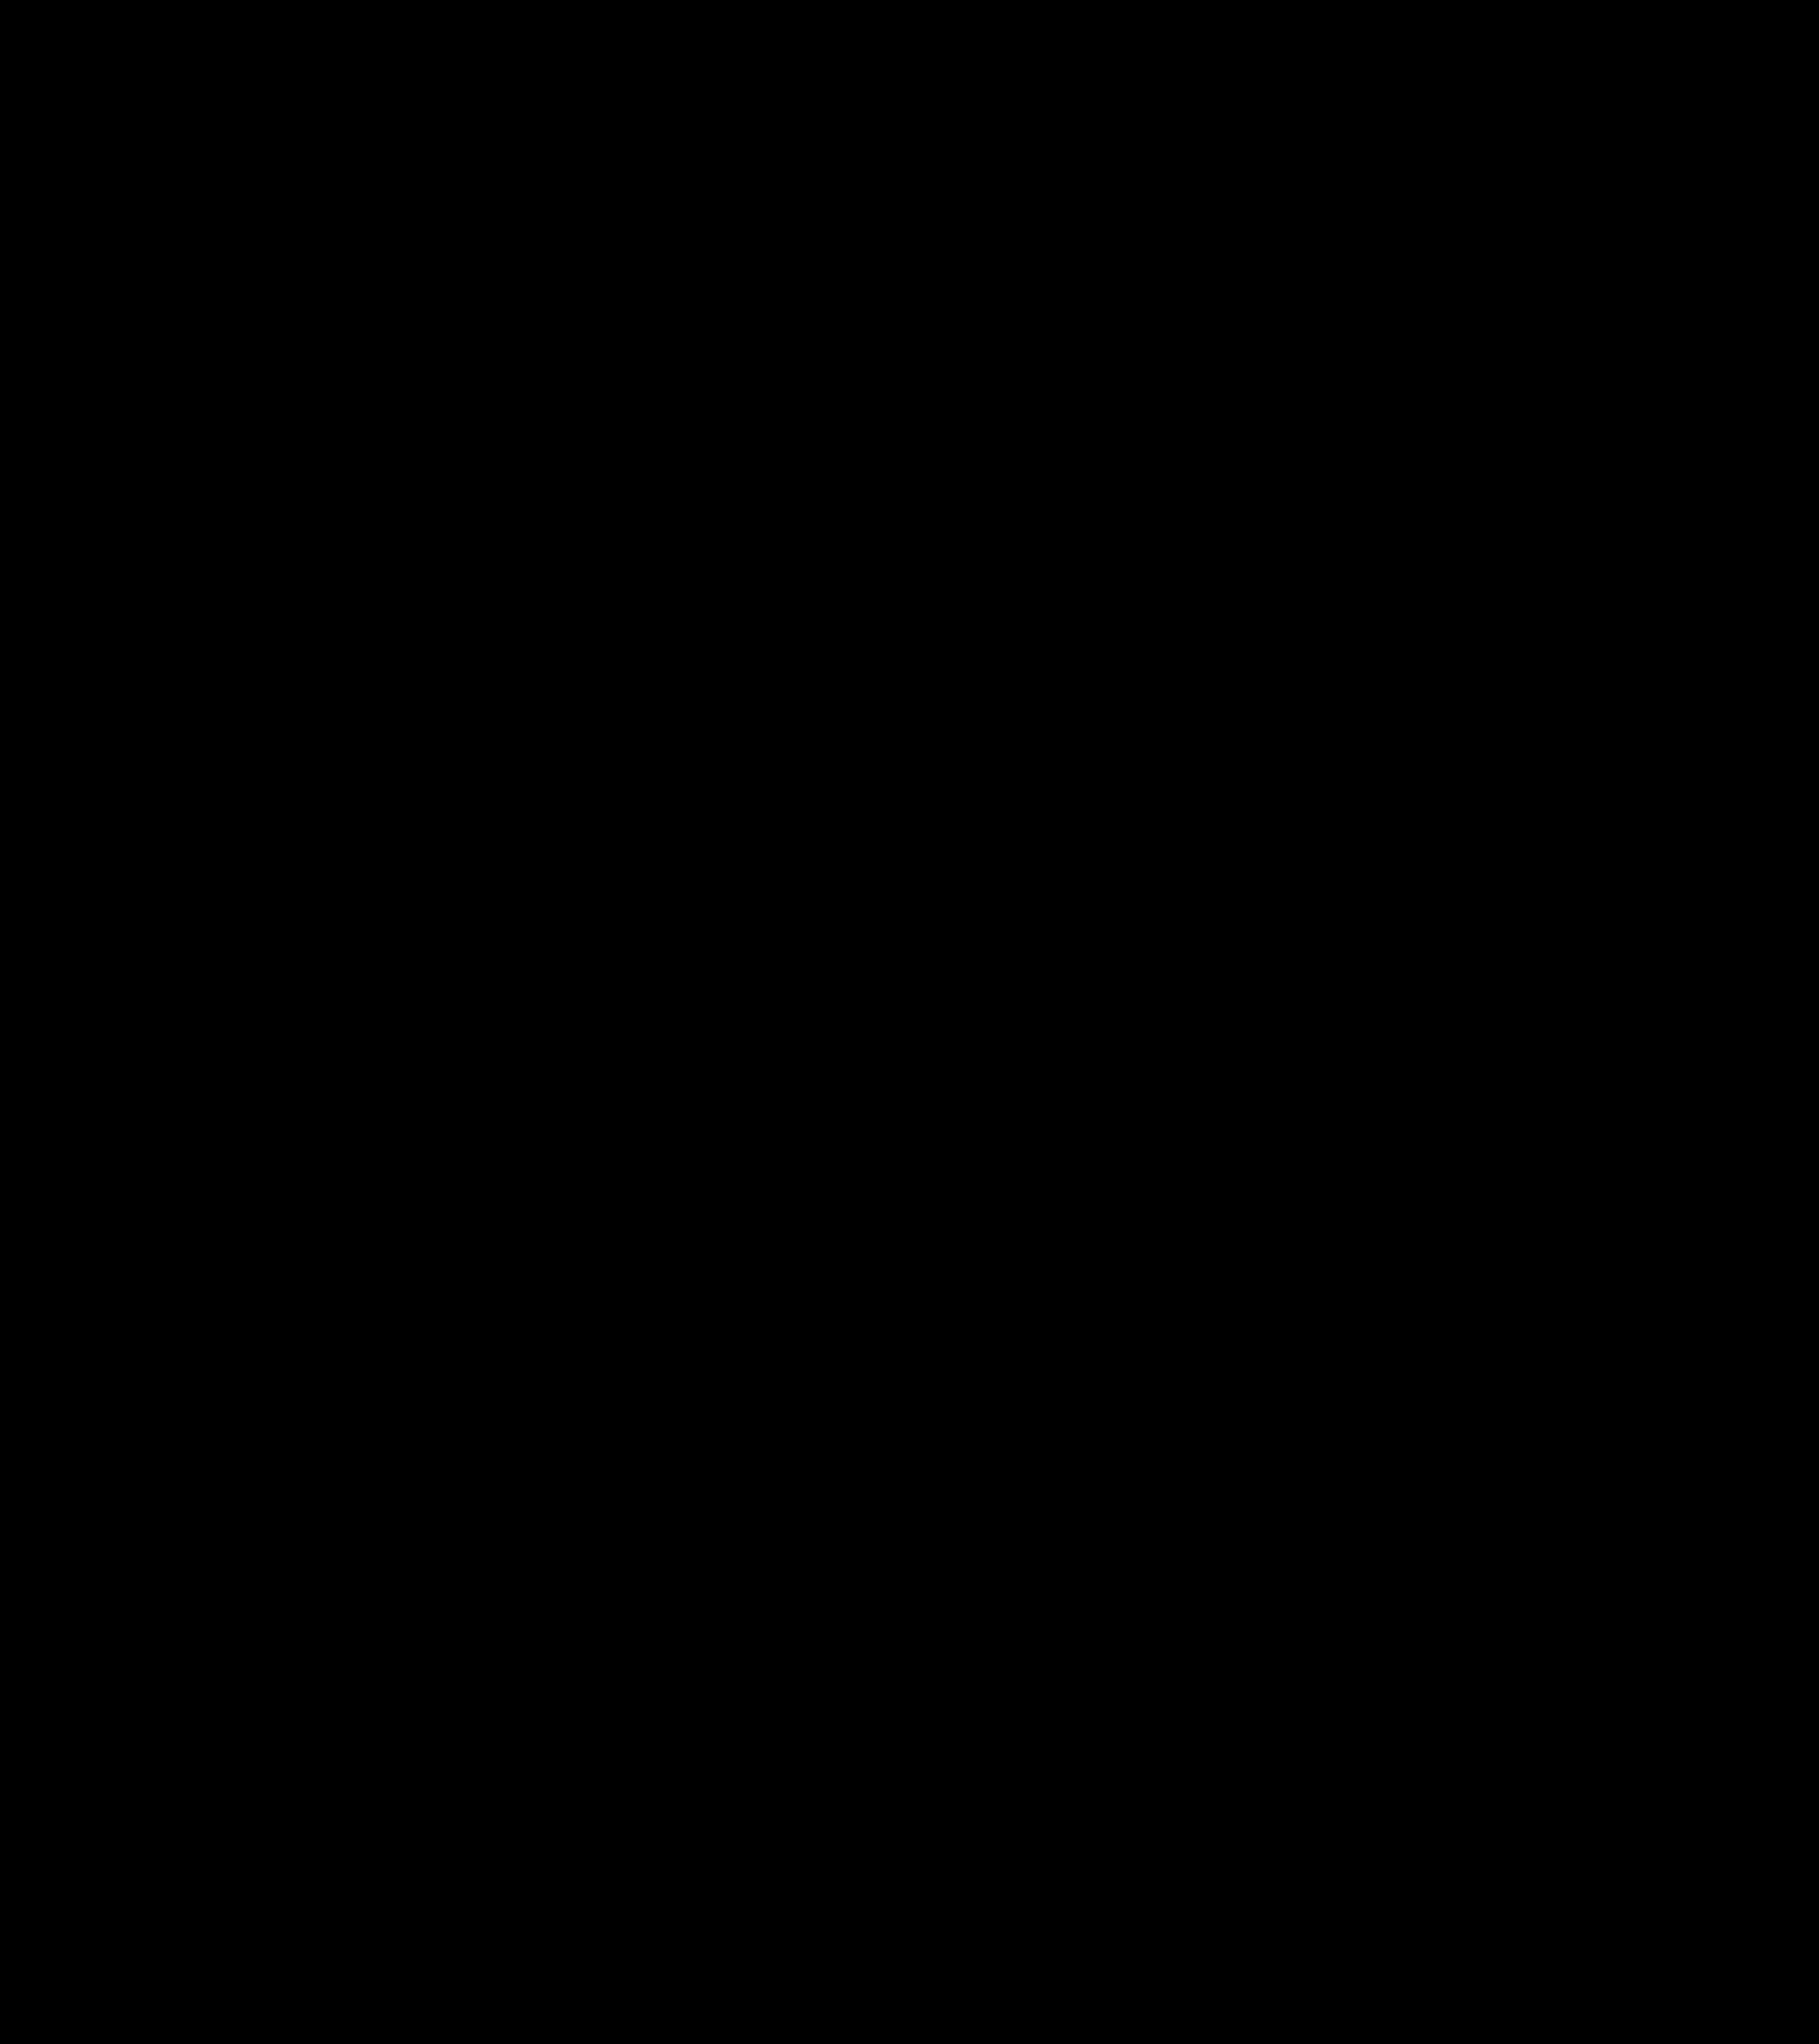 Logo 1434552351.png?ixlib=rb 1.1